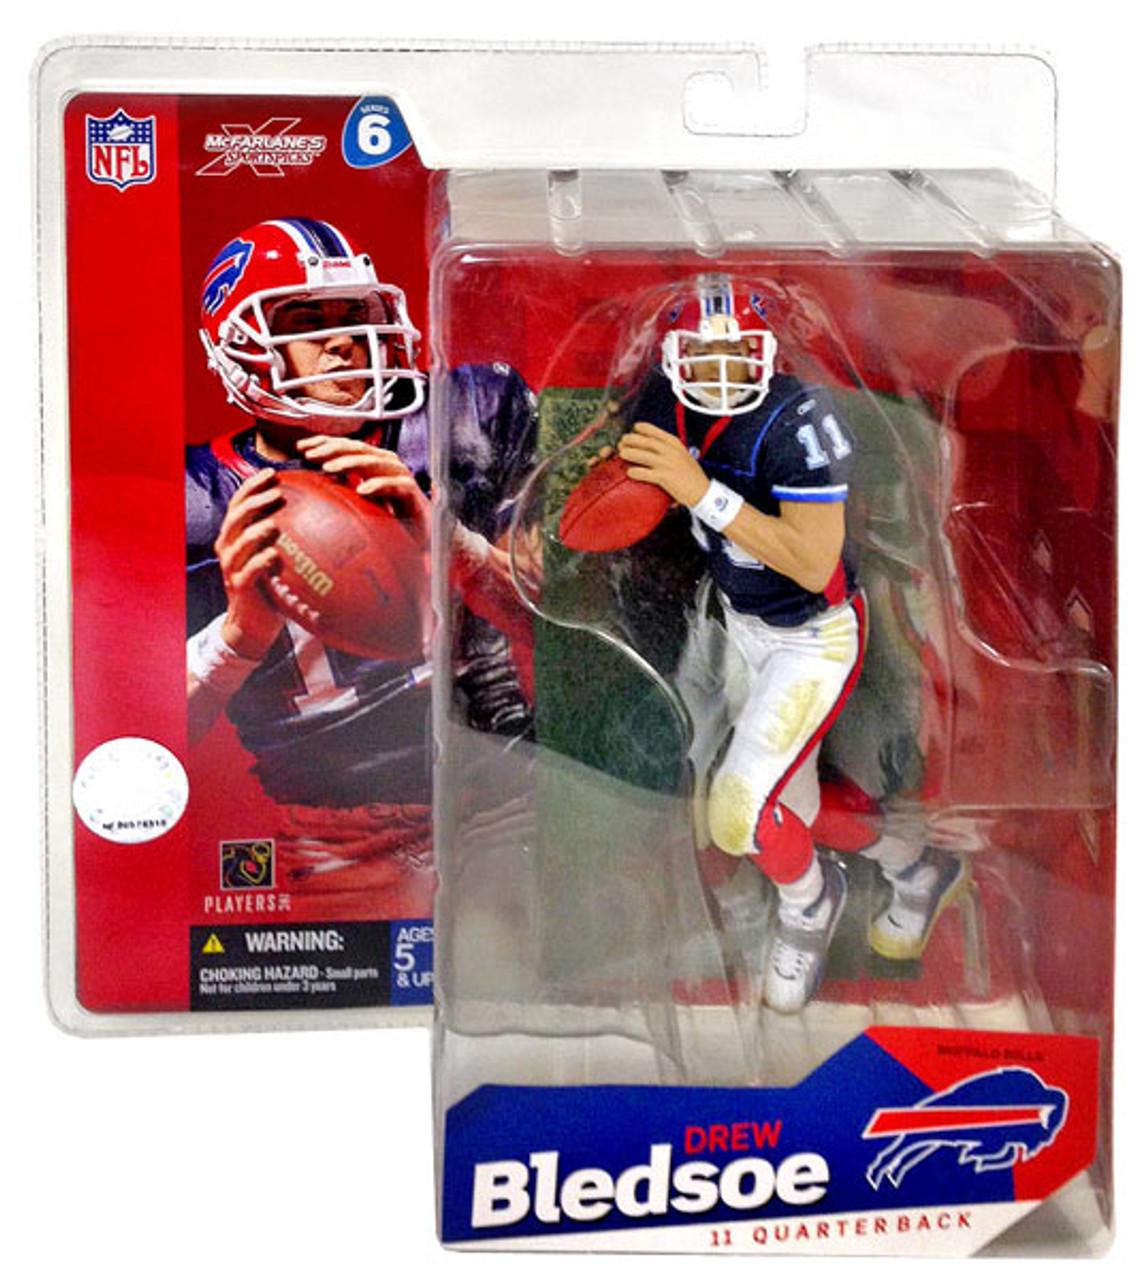 McFarlane Toys NFL Buffalo Bills Sports Picks Series 6 Drew Bledsoe Action Figure [Blue Jersey]